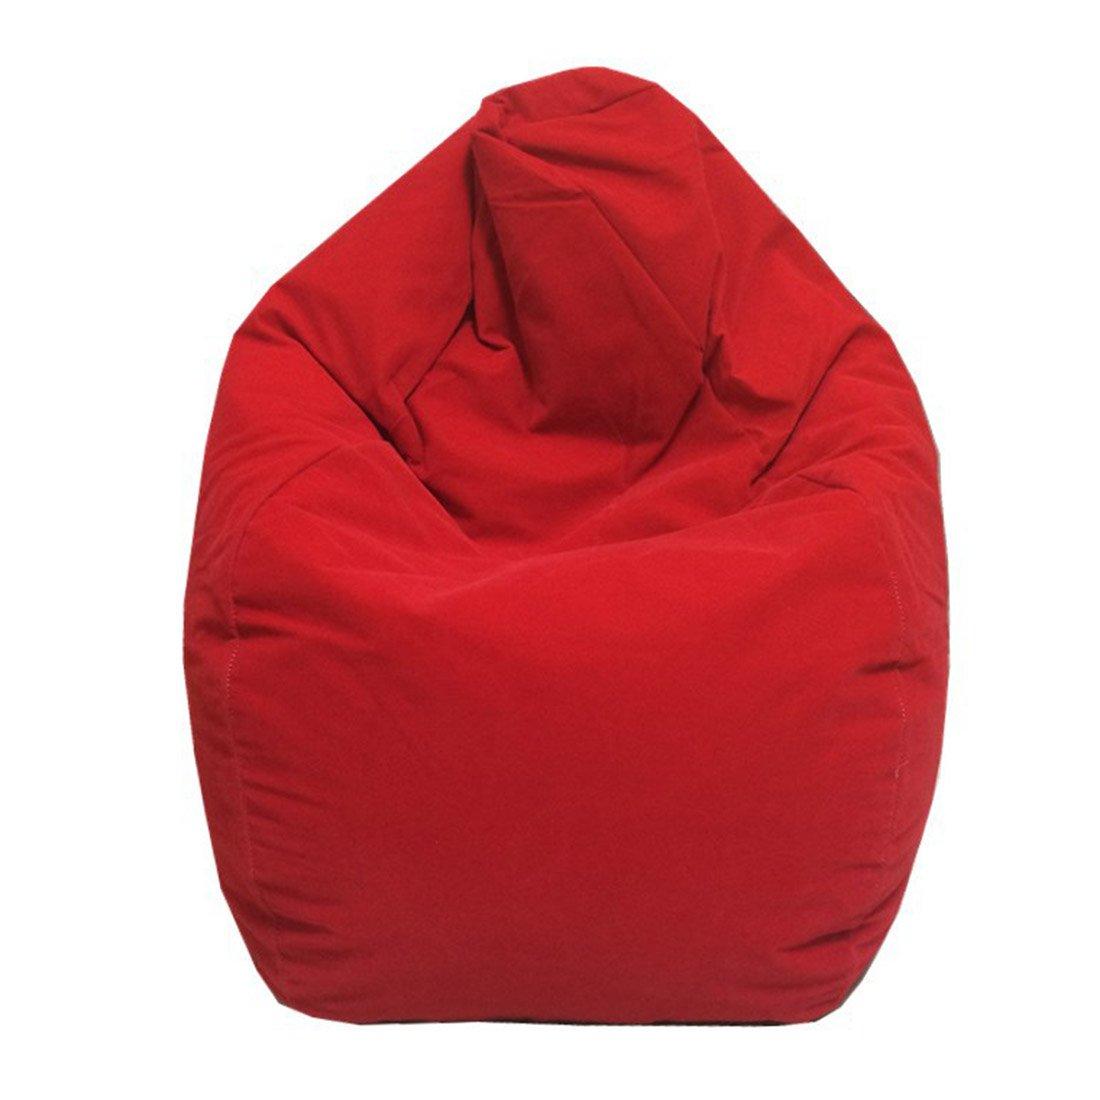 Jiyaru Bean Bag Chair Kids Lazy Sofa Seat Cushion Washable Beanbag Beige